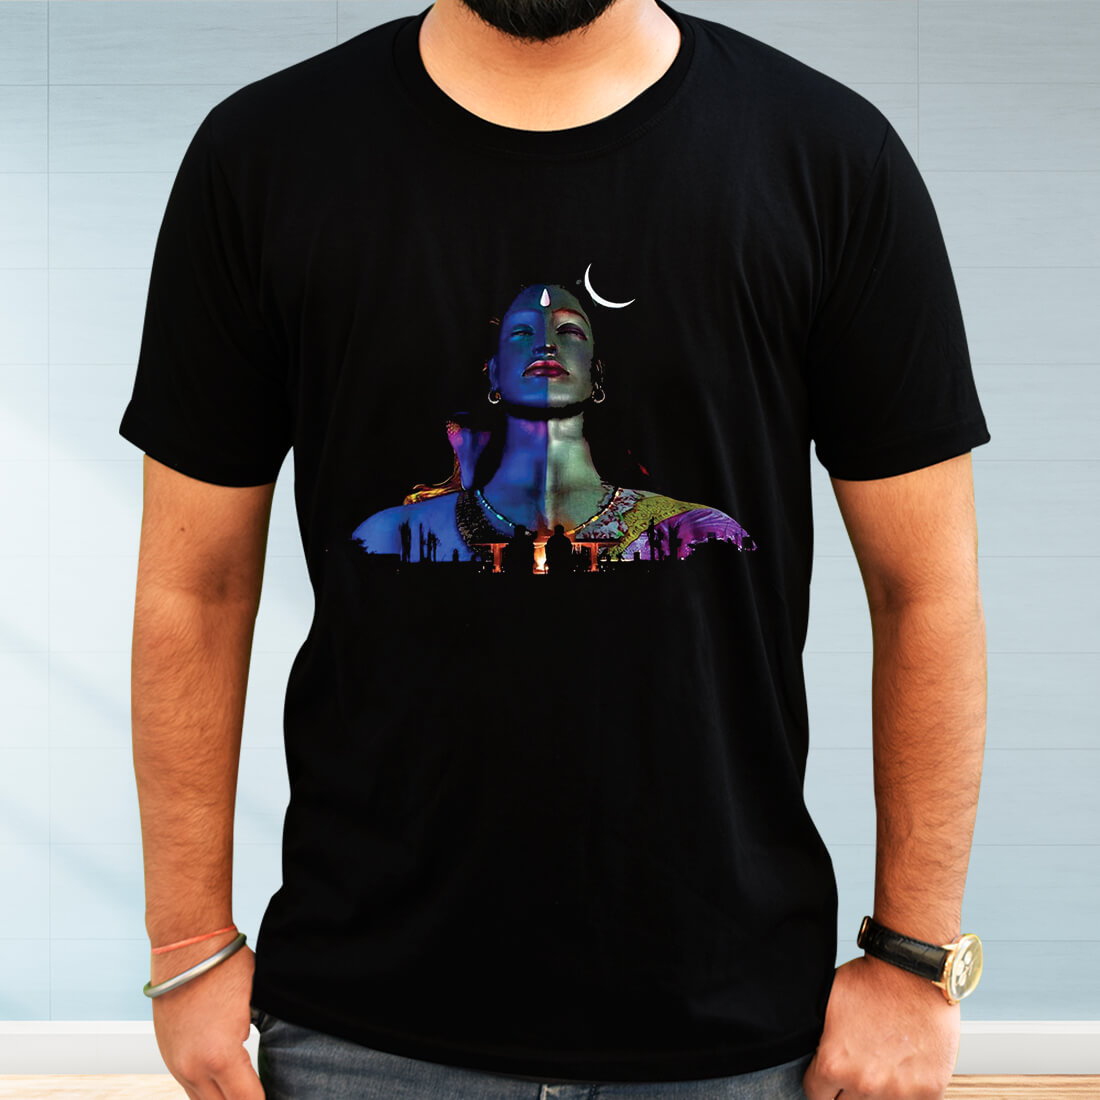 Adiyogi Images Printed Black T-Shirt